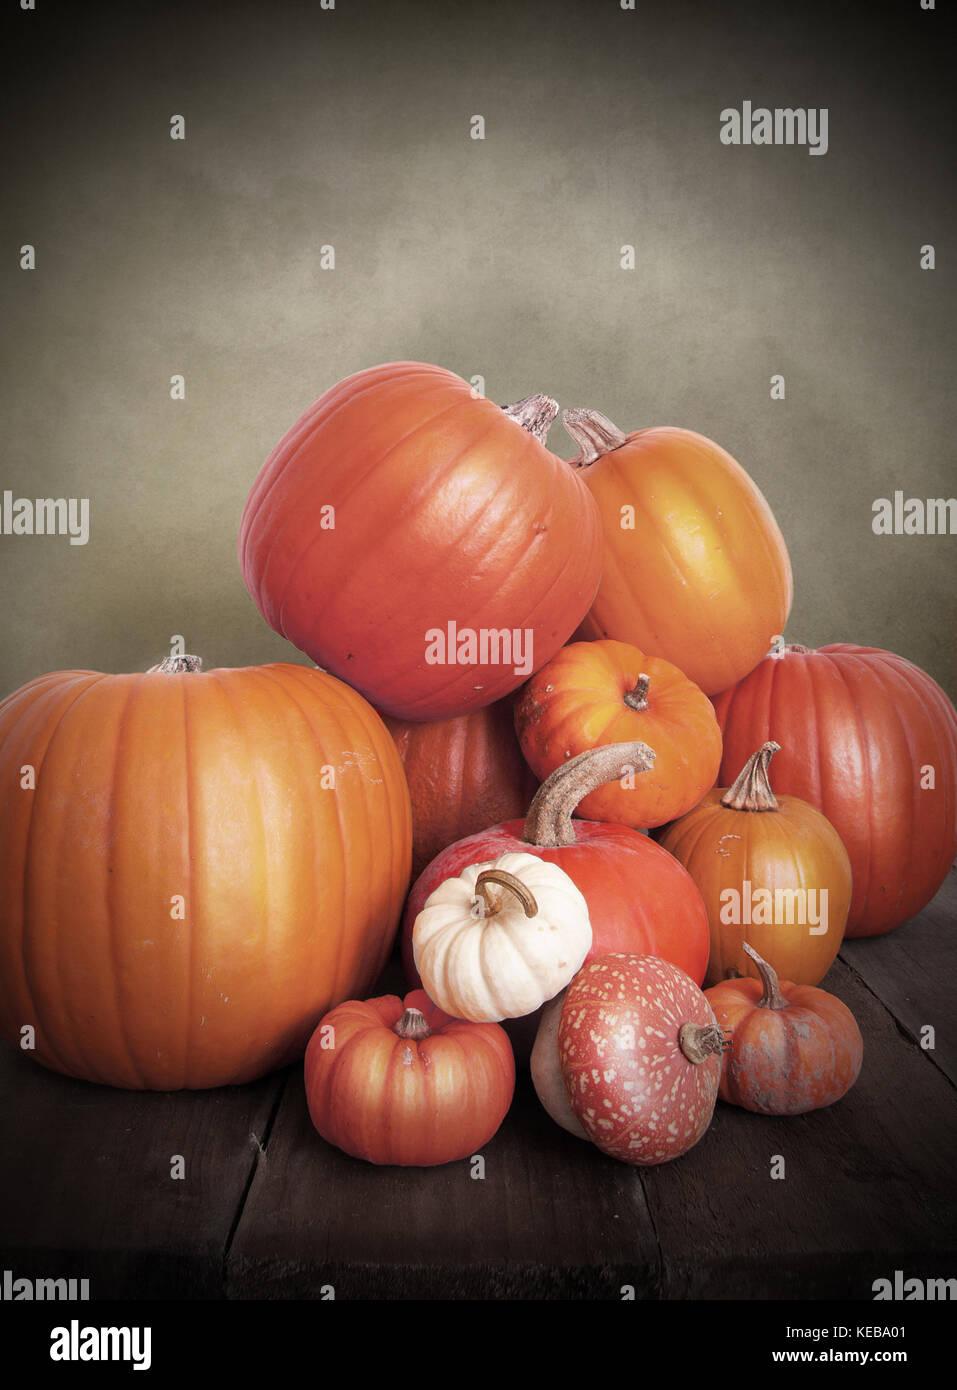 Seasons autumn fall season seasons greetings stock photos seasons vintage pumpkins stock image m4hsunfo